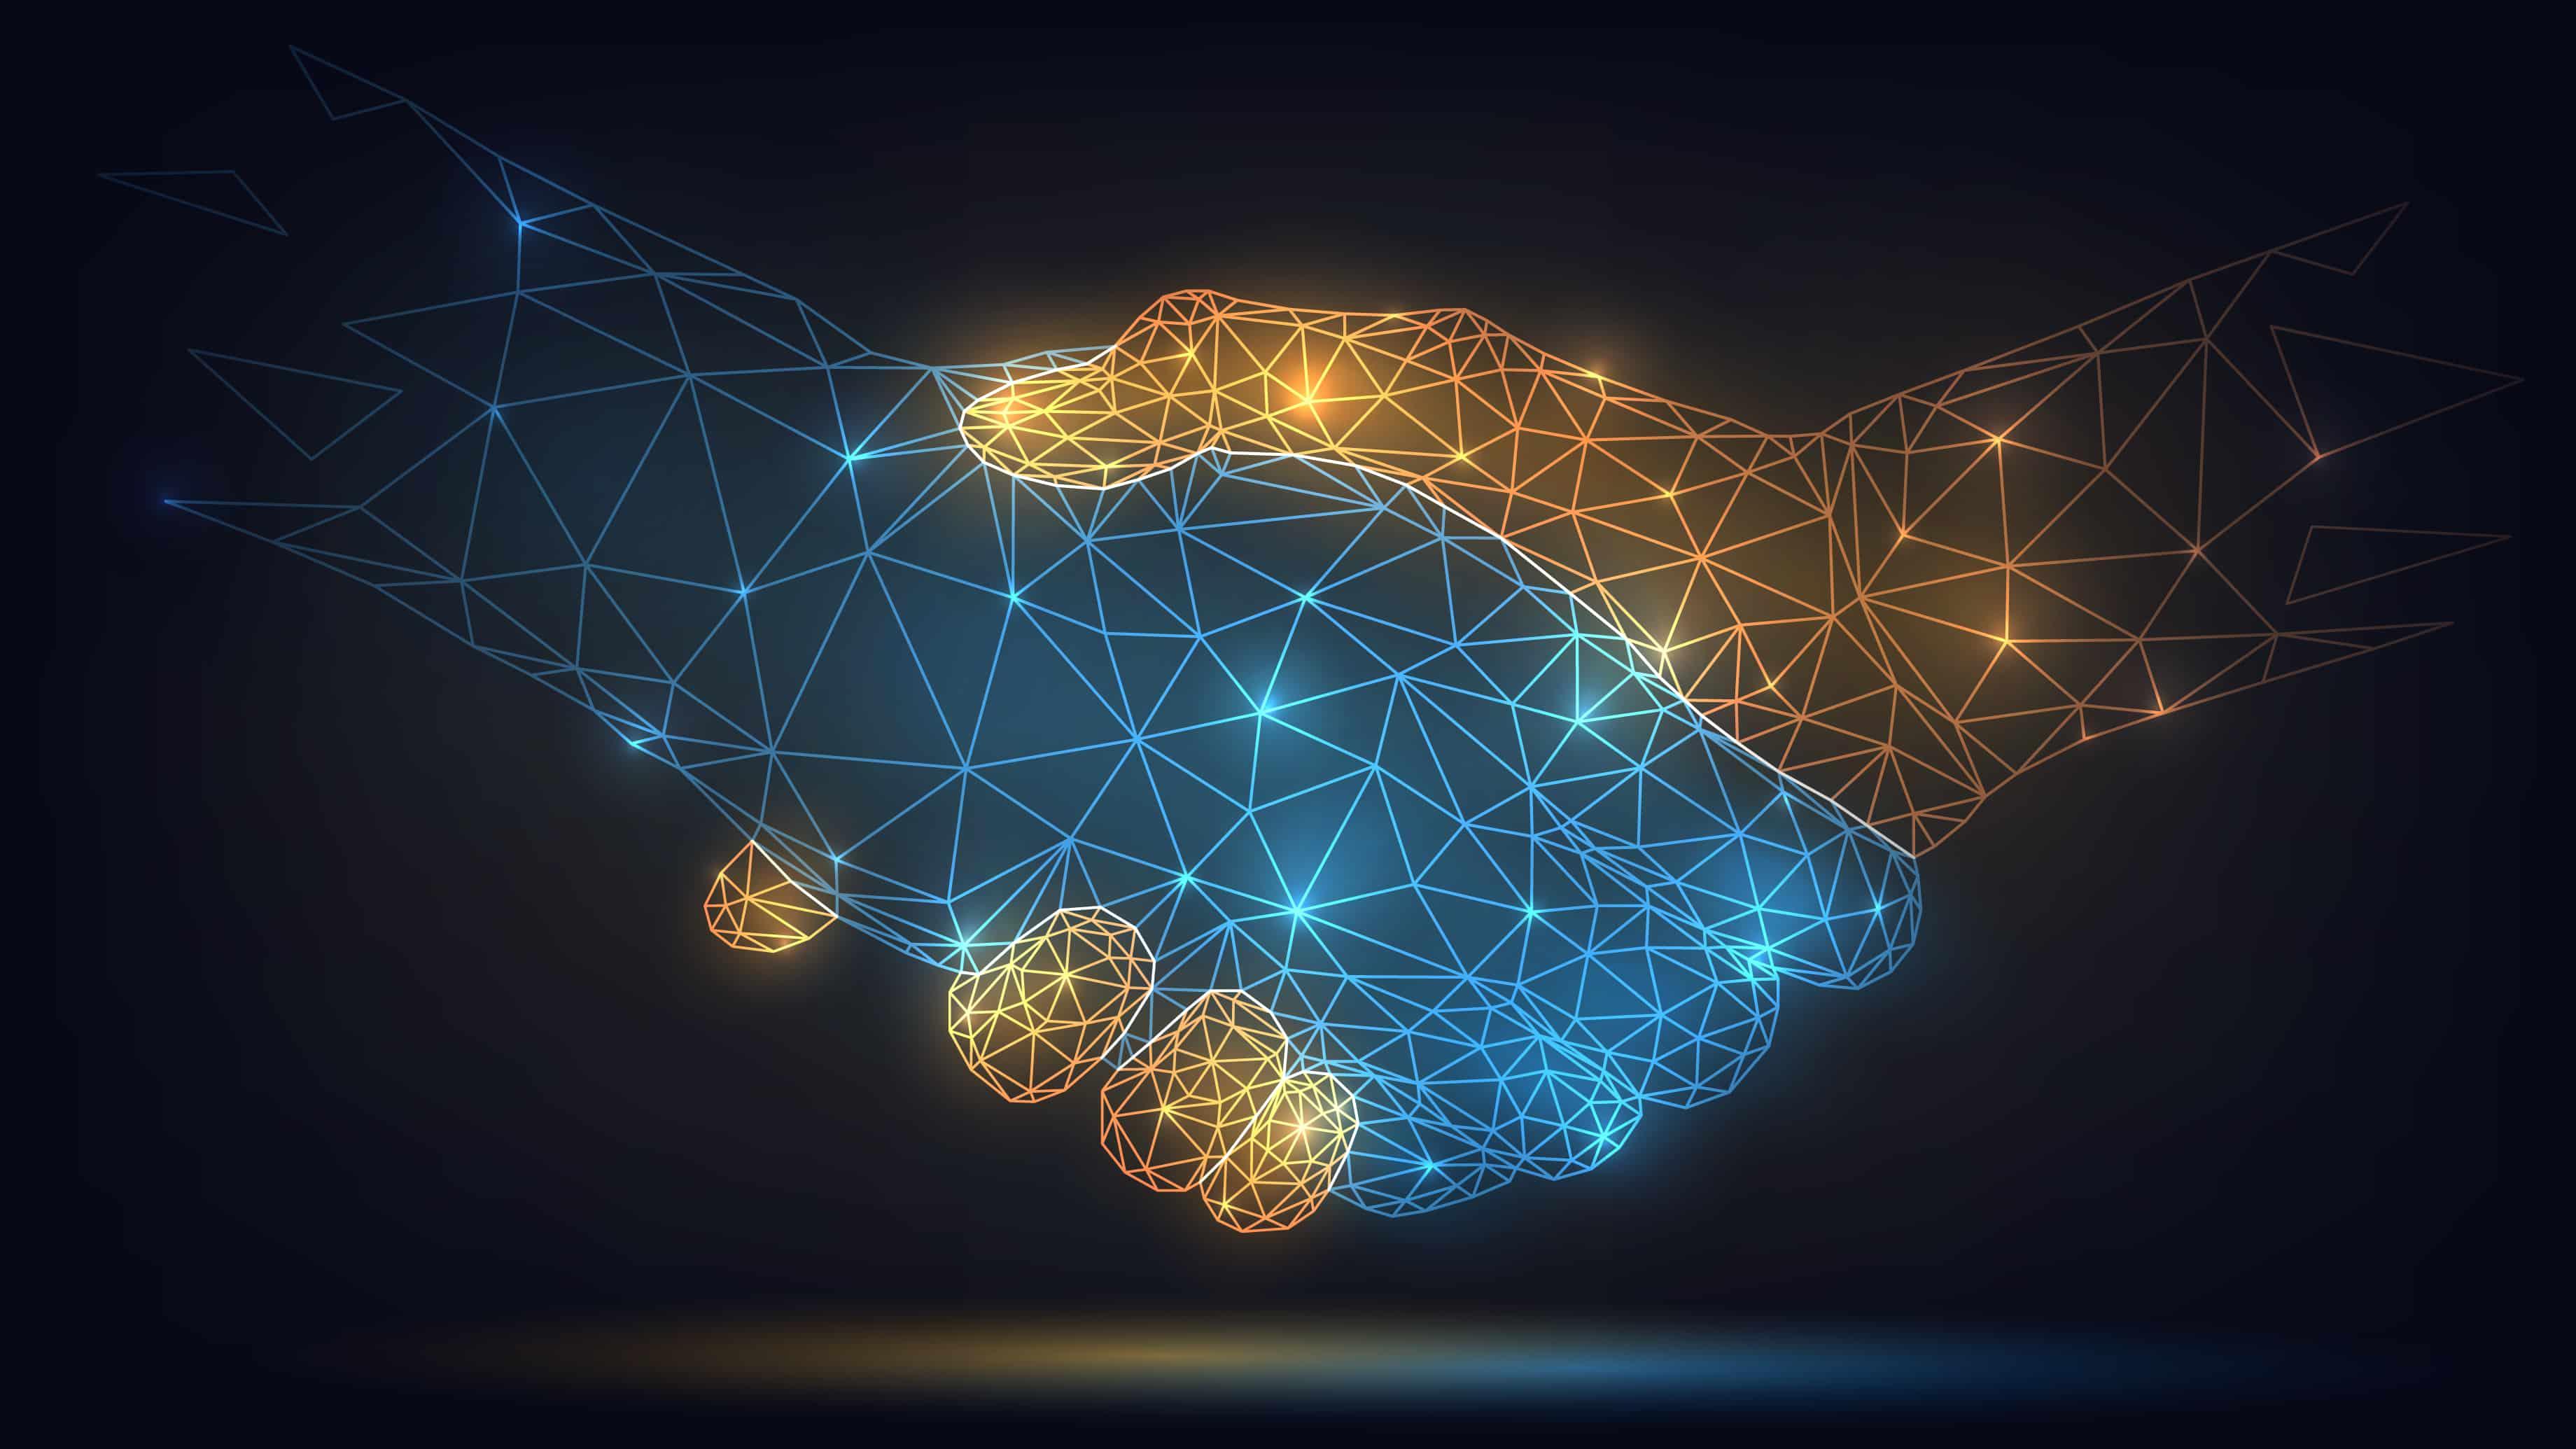 Digital hand shake image